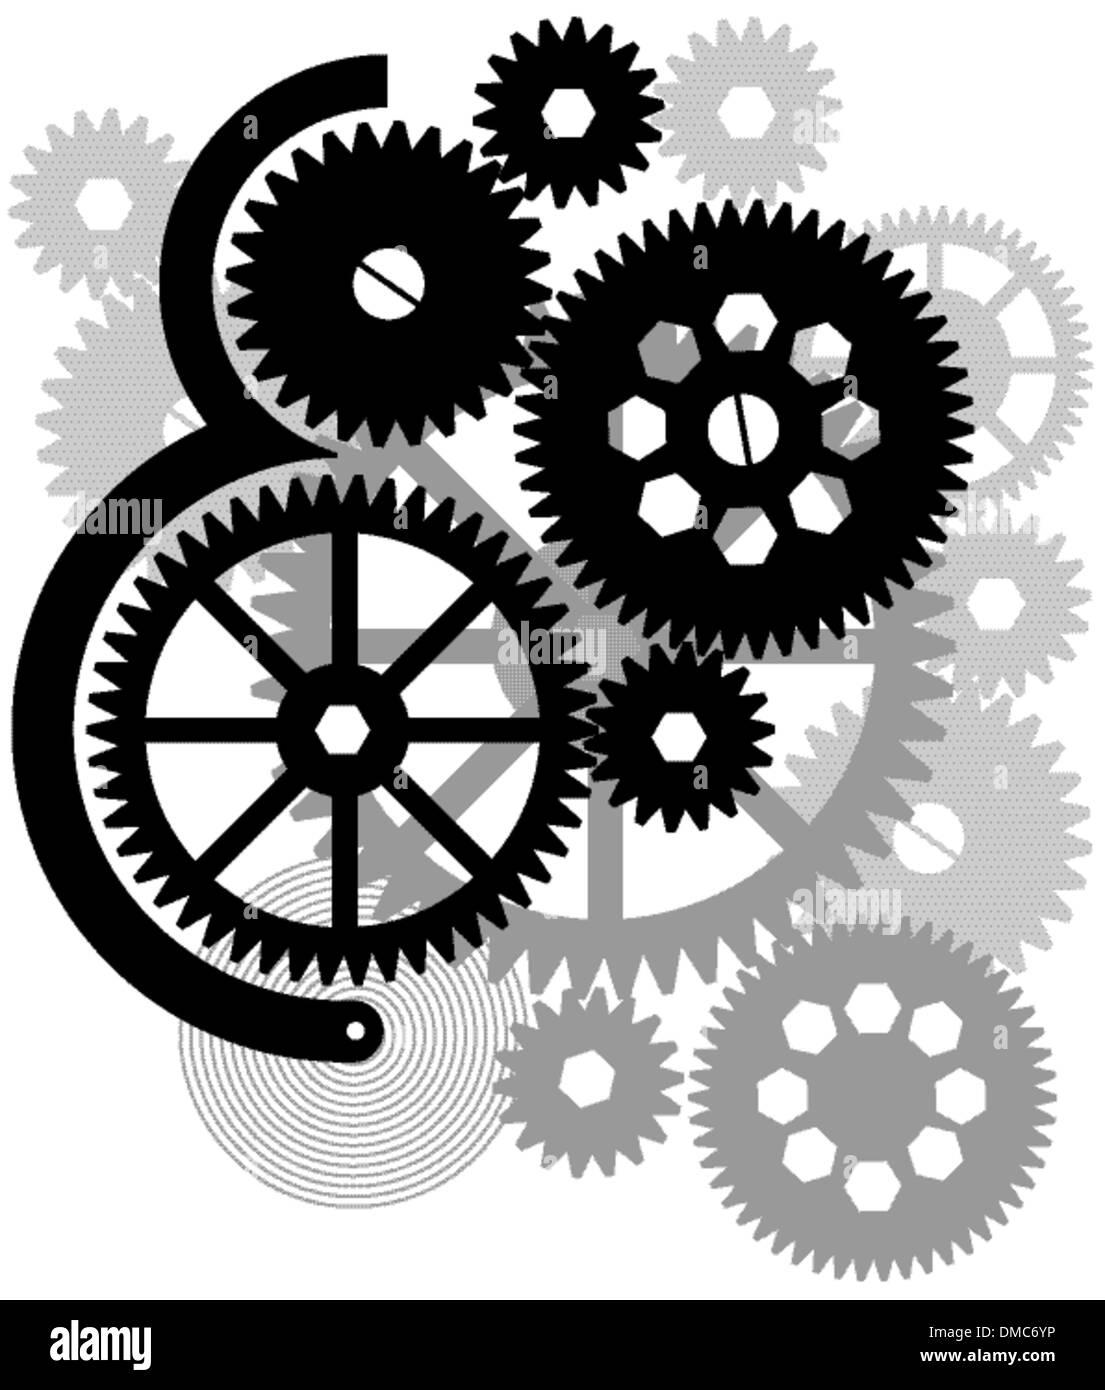 Gear drive - Stock Vector